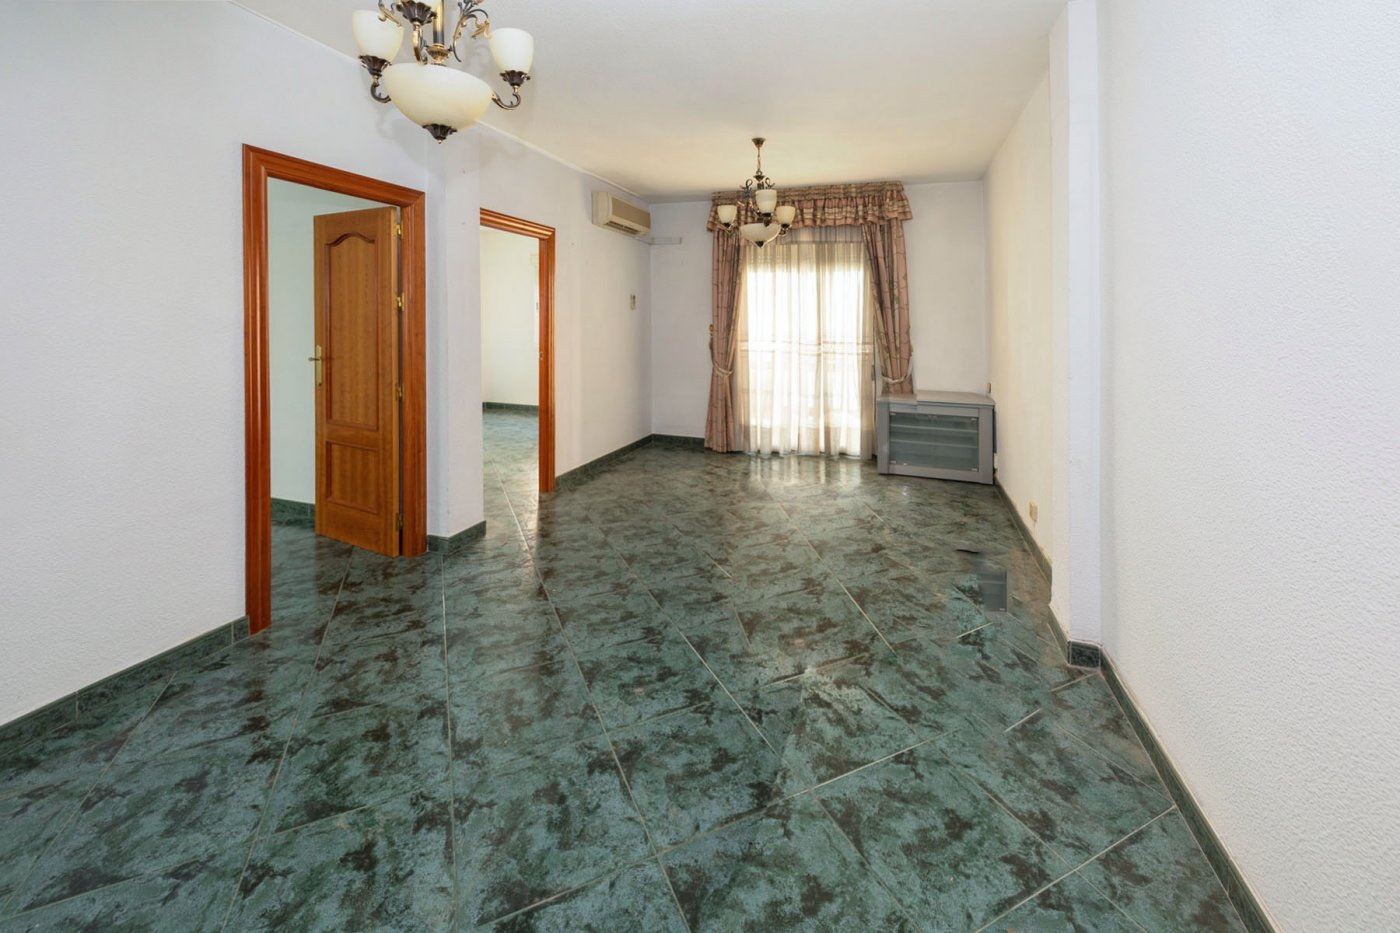 Fantástico piso en albolote